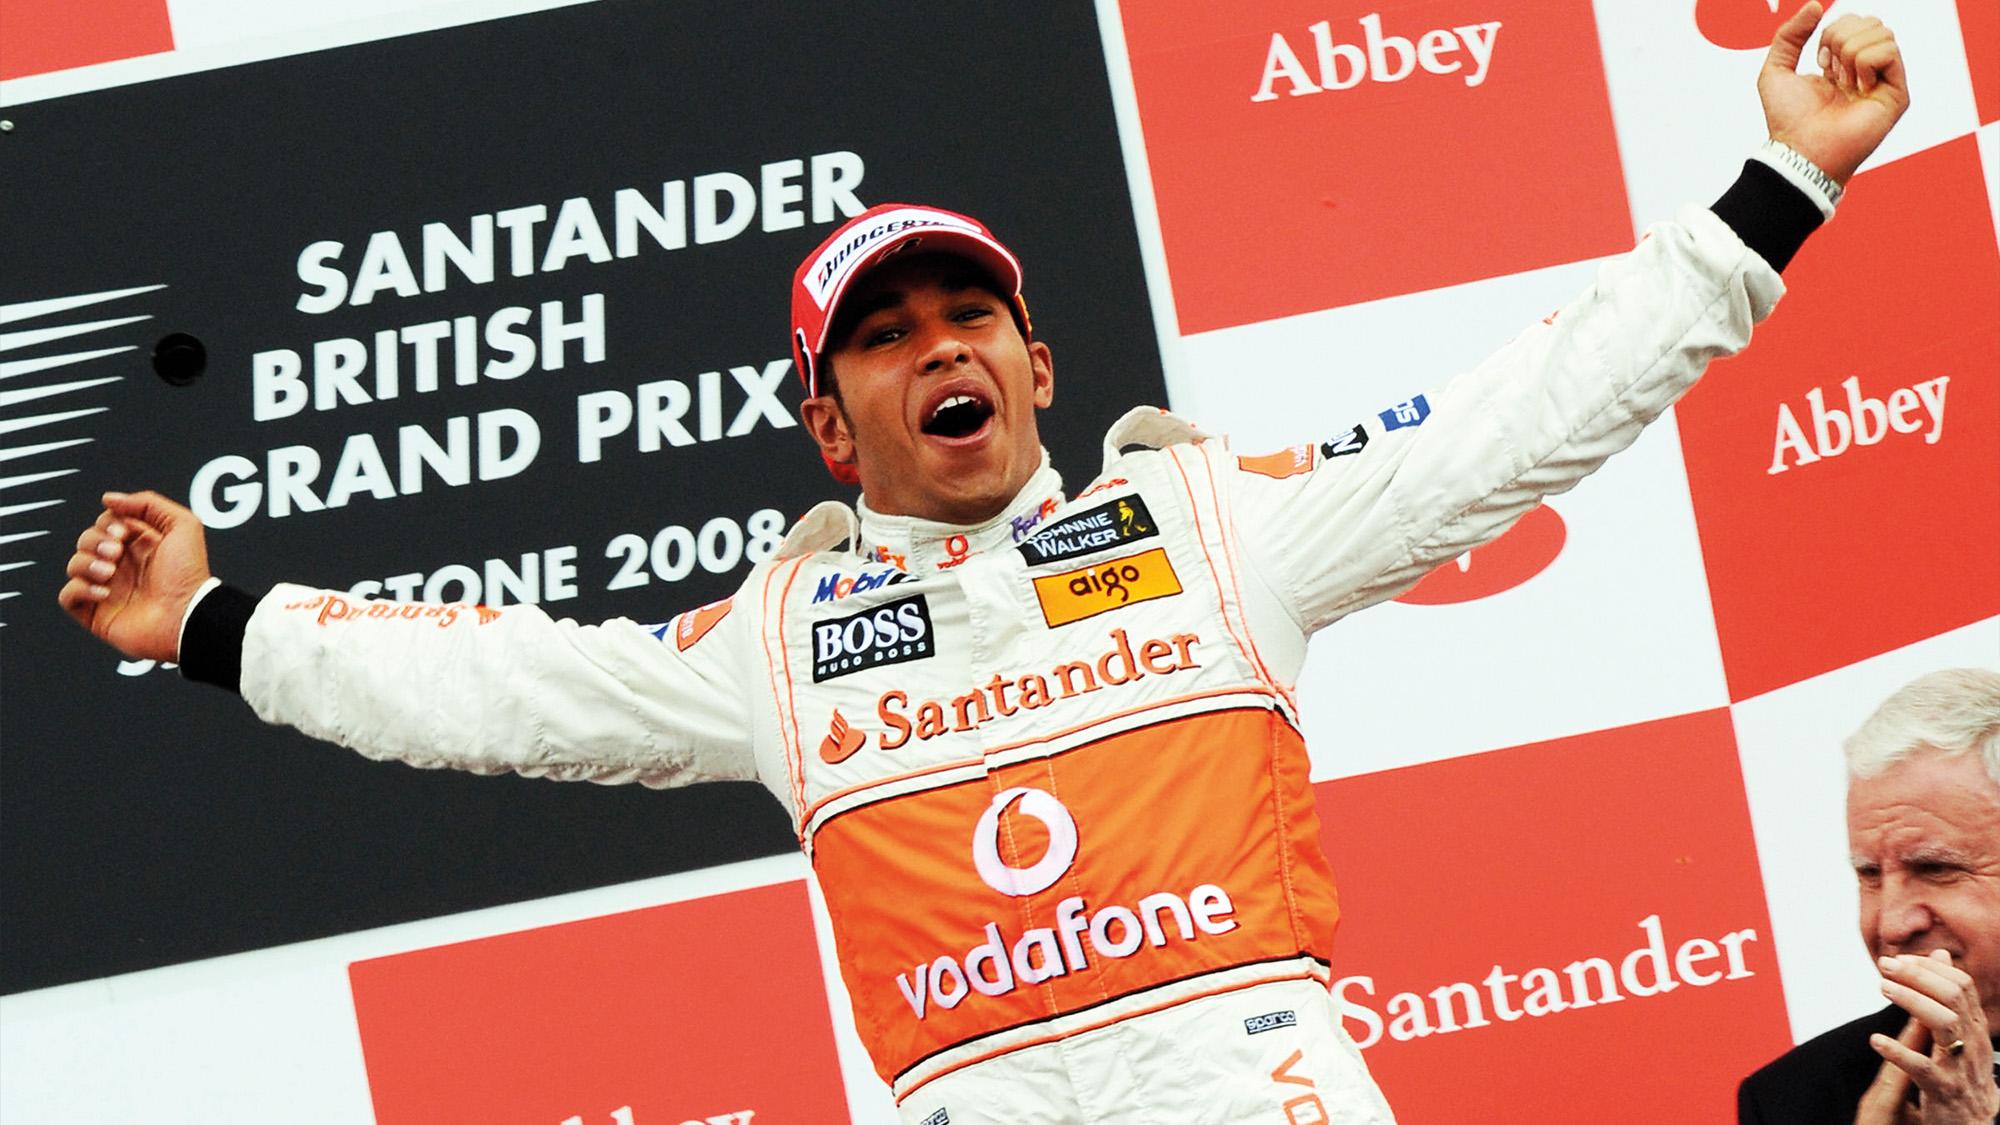 Lewis Hamilton on the podium after winning the 2008 F1 British Grand Prix with McLaren